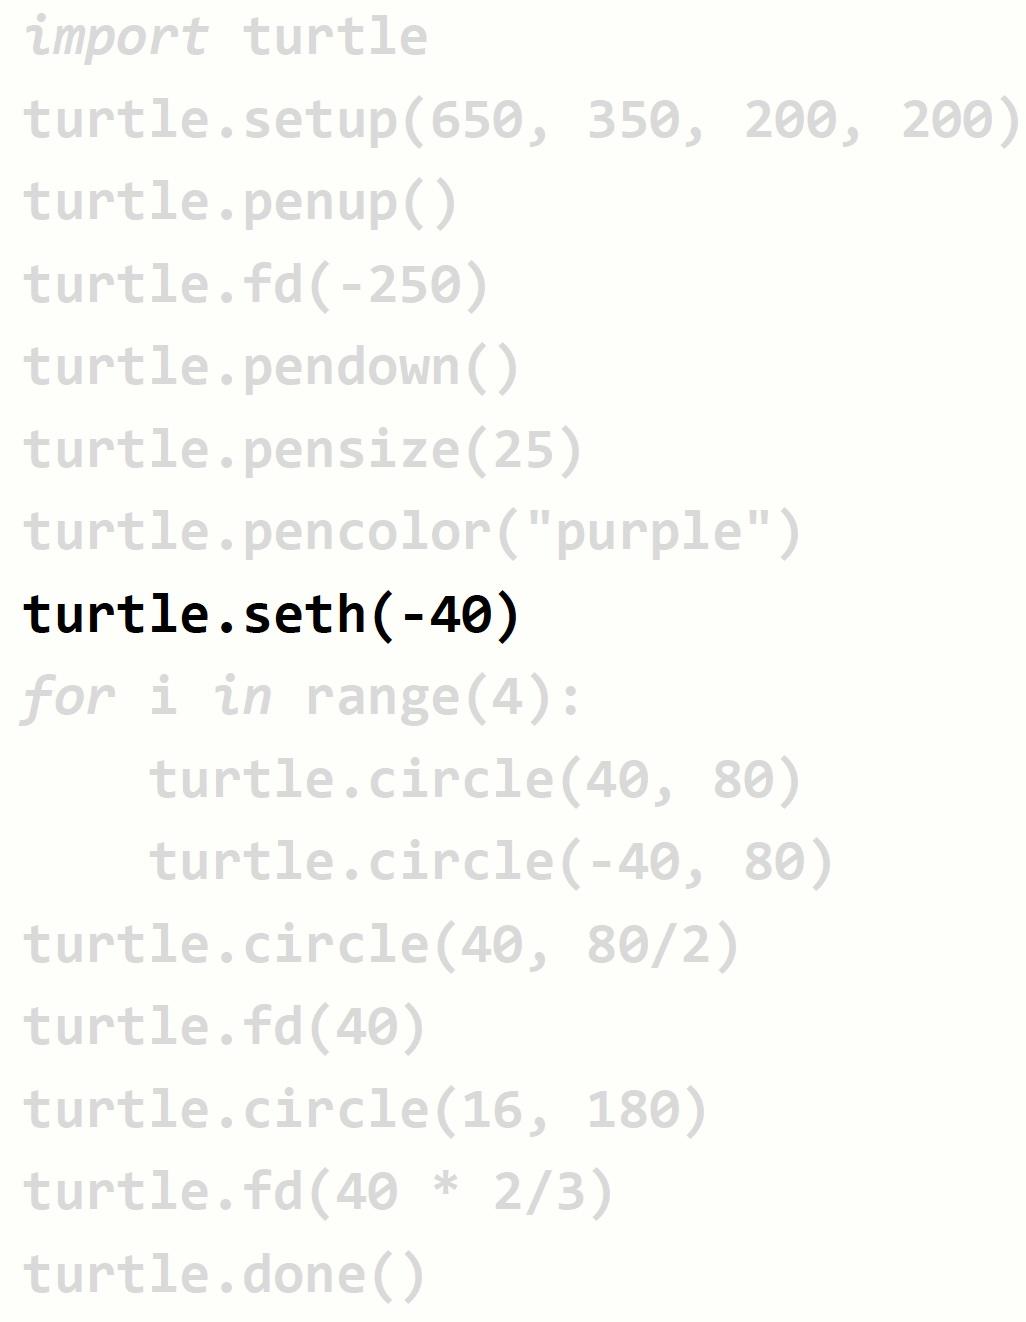 013-turtle程序语法元素分析-08.jpg?x-oss-process=style/watermark